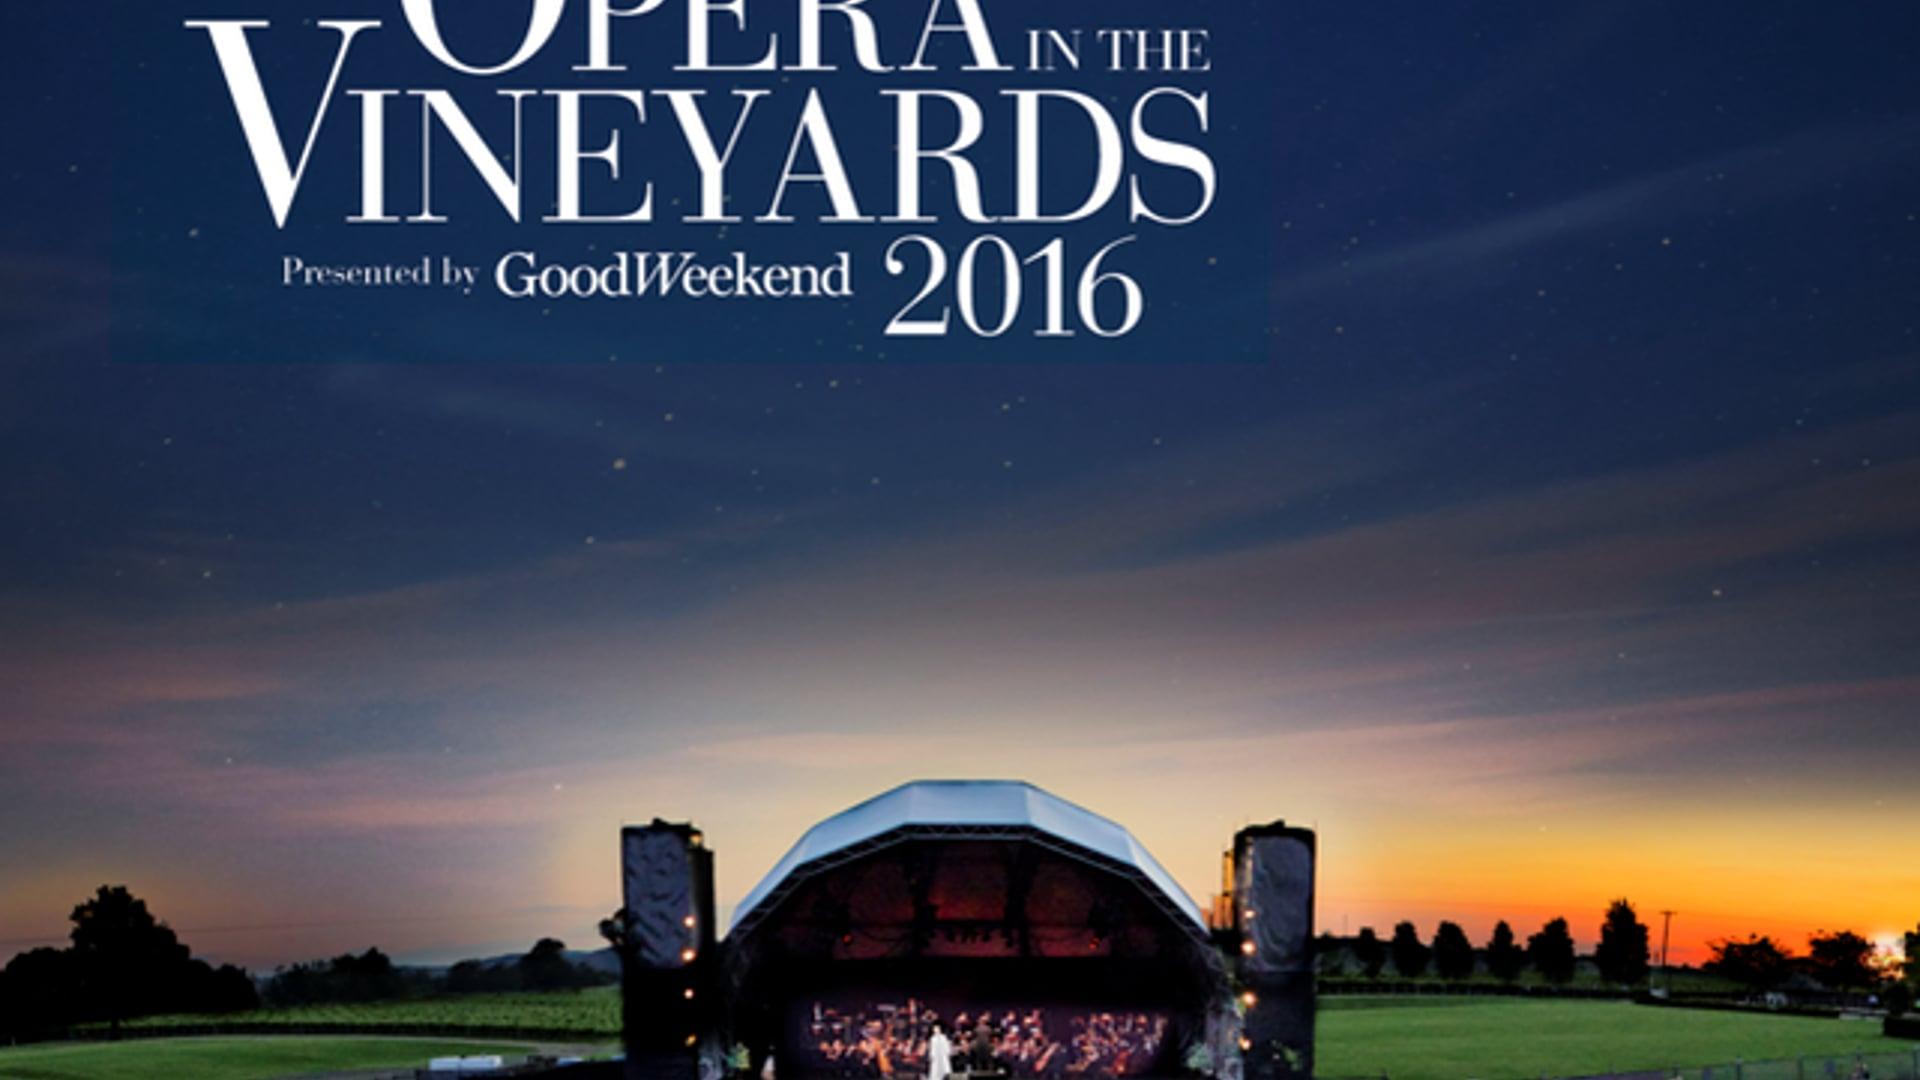 Opera in the Vineyards